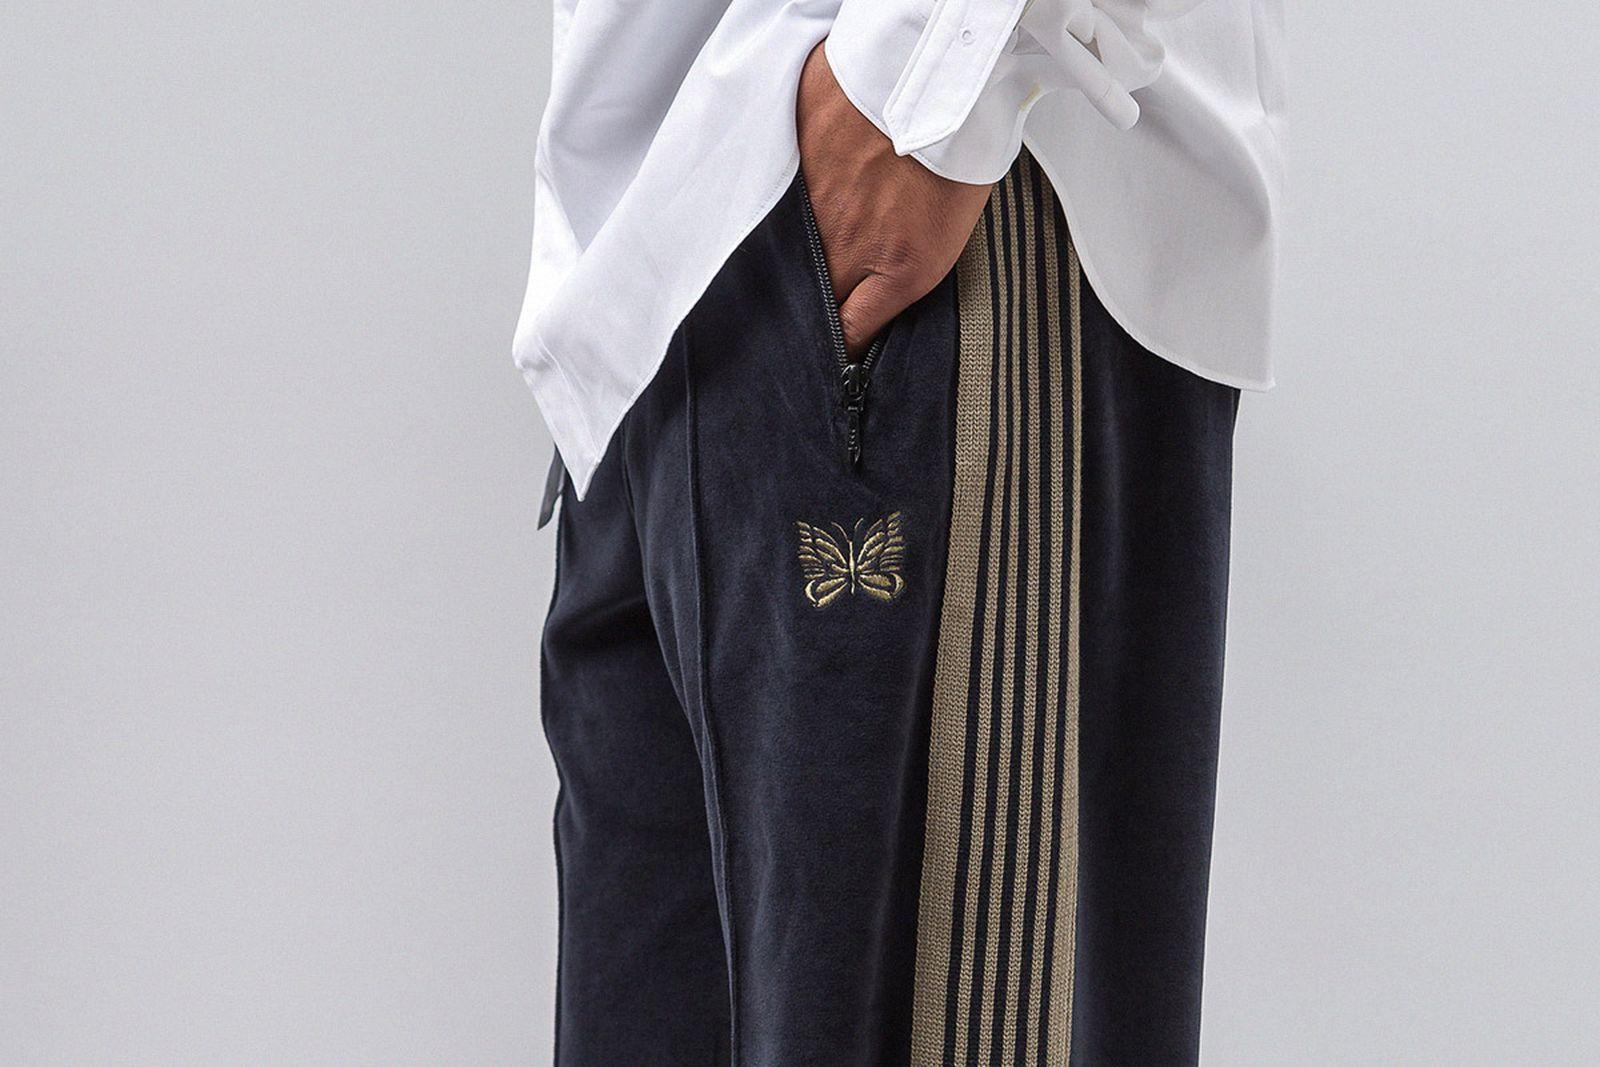 needles-track-pants-6